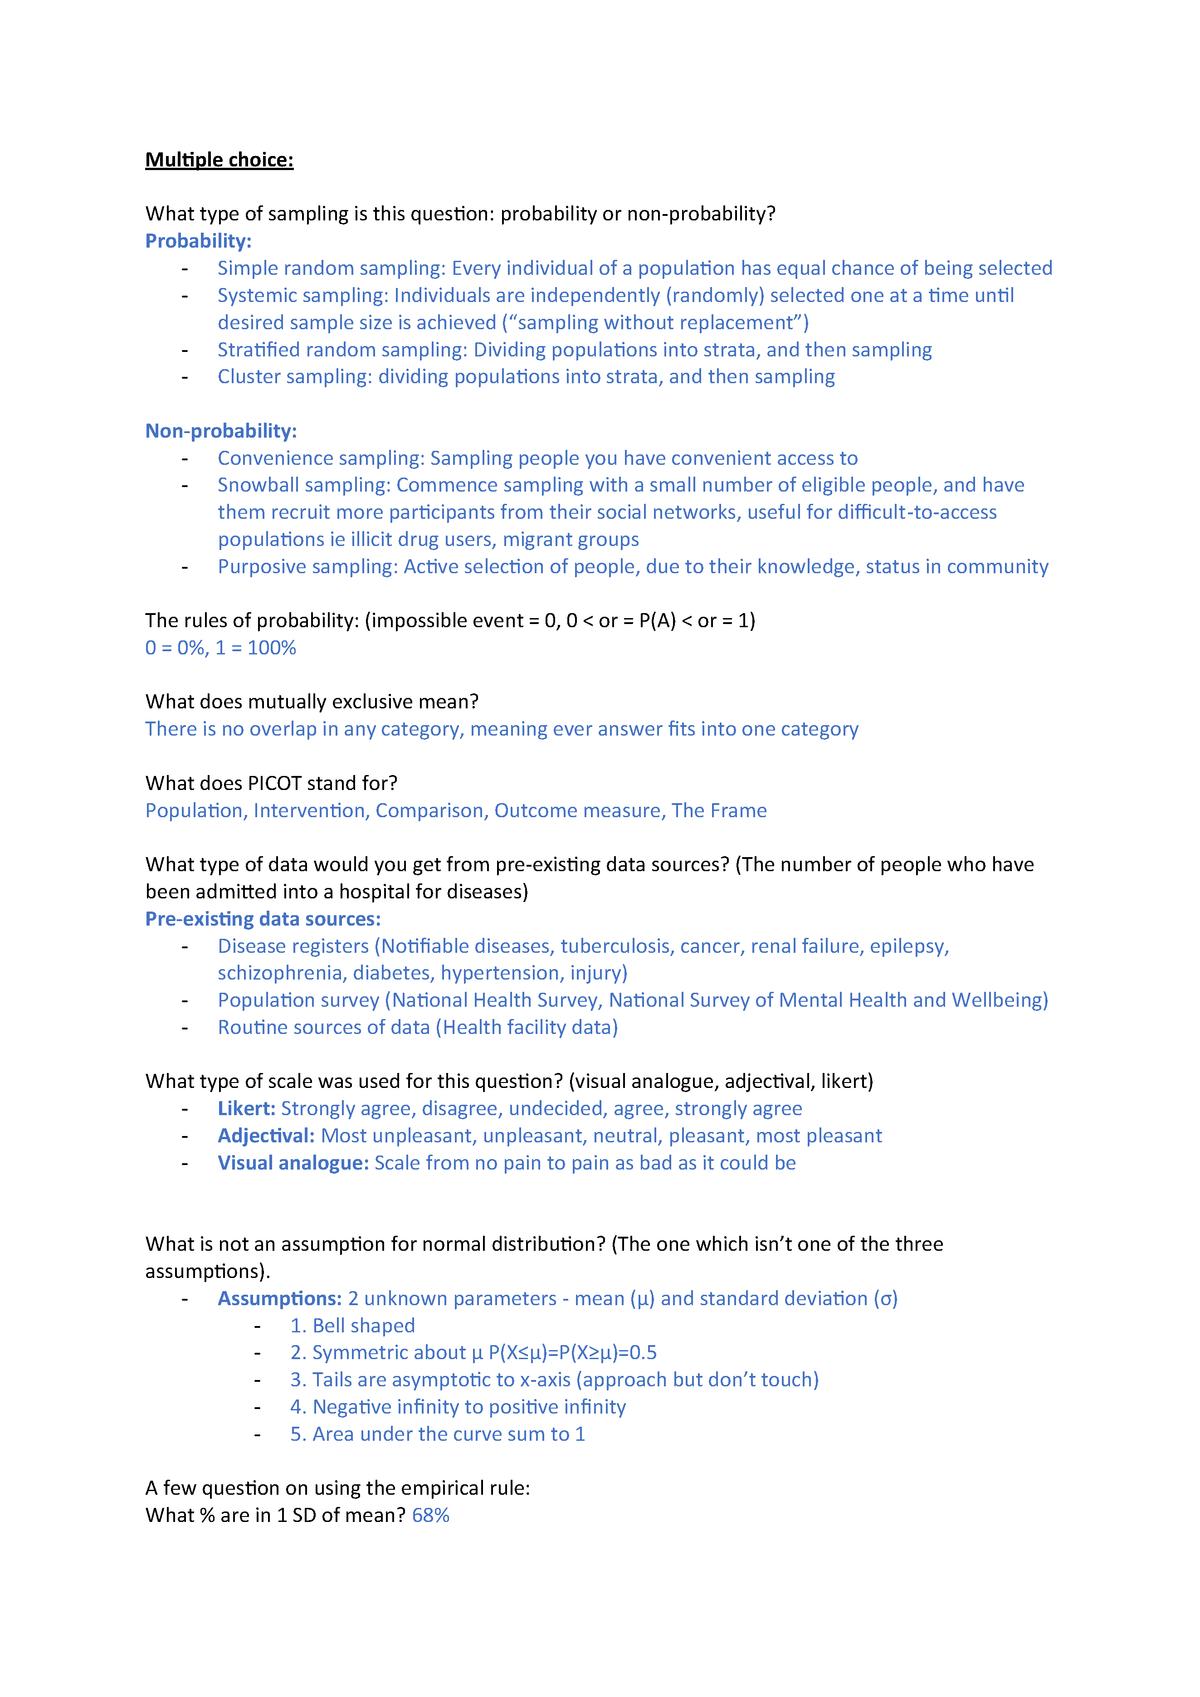 Exam 2018 - HS2402:03: Health Professional Research 1 - StuDocu